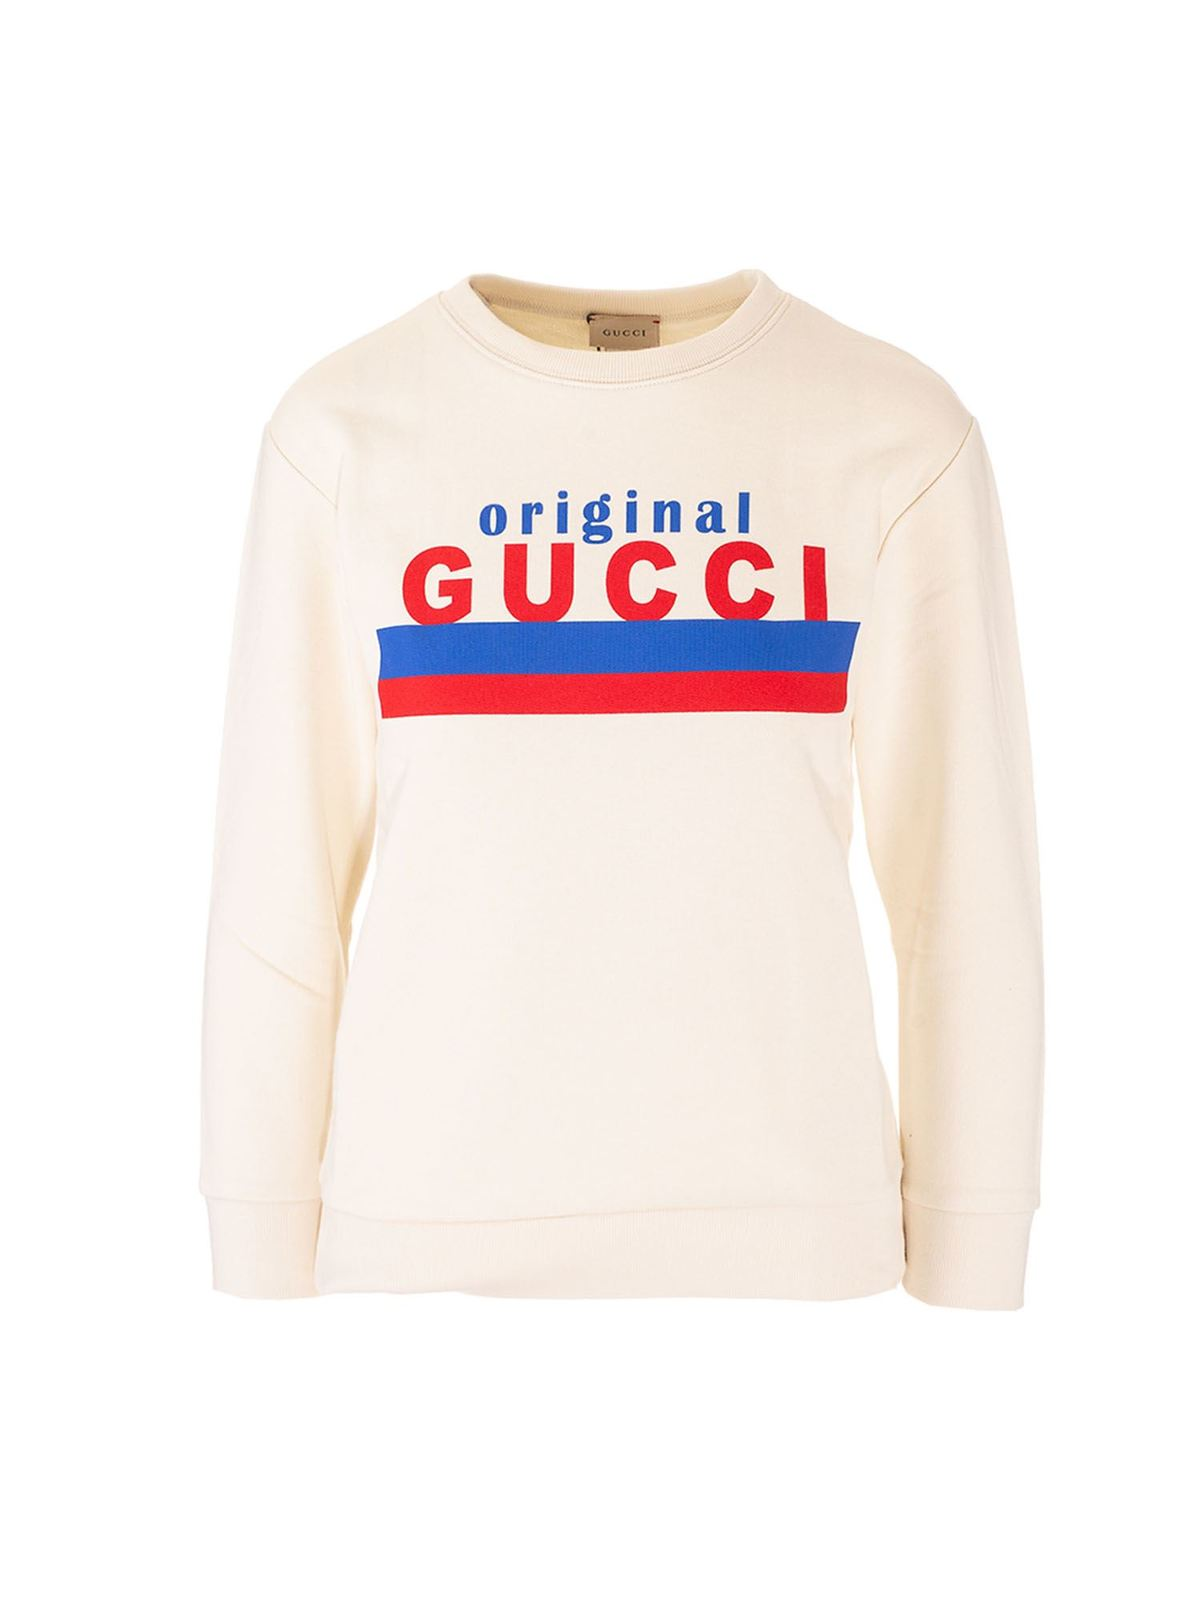 Gucci ORIGINAL GUCCI SWEATERS IN WHITE